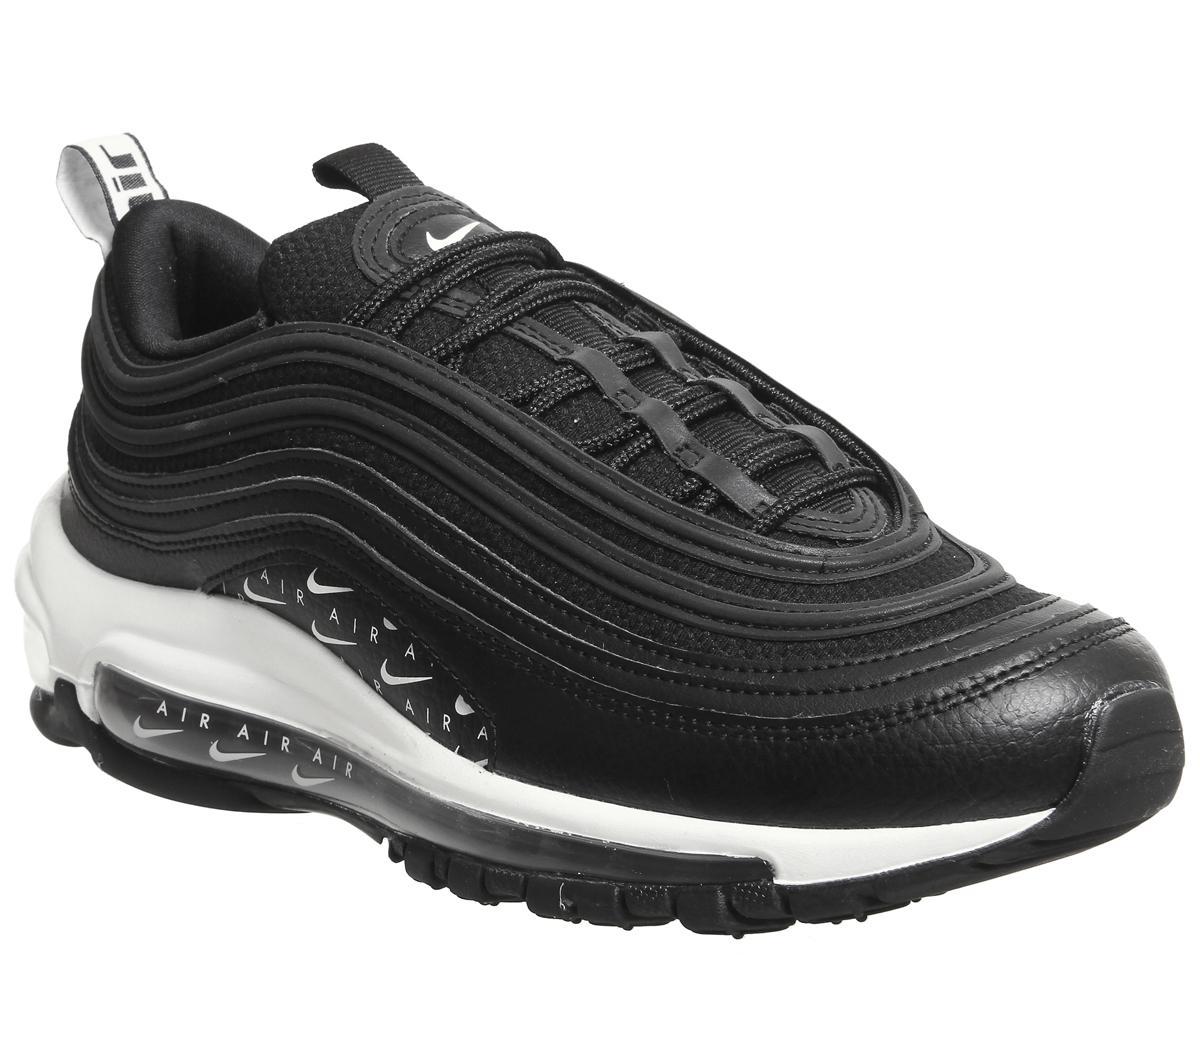 8.5 5.5 Shoes Size 5.5 US Men Women Nike Air Max 97 Summer